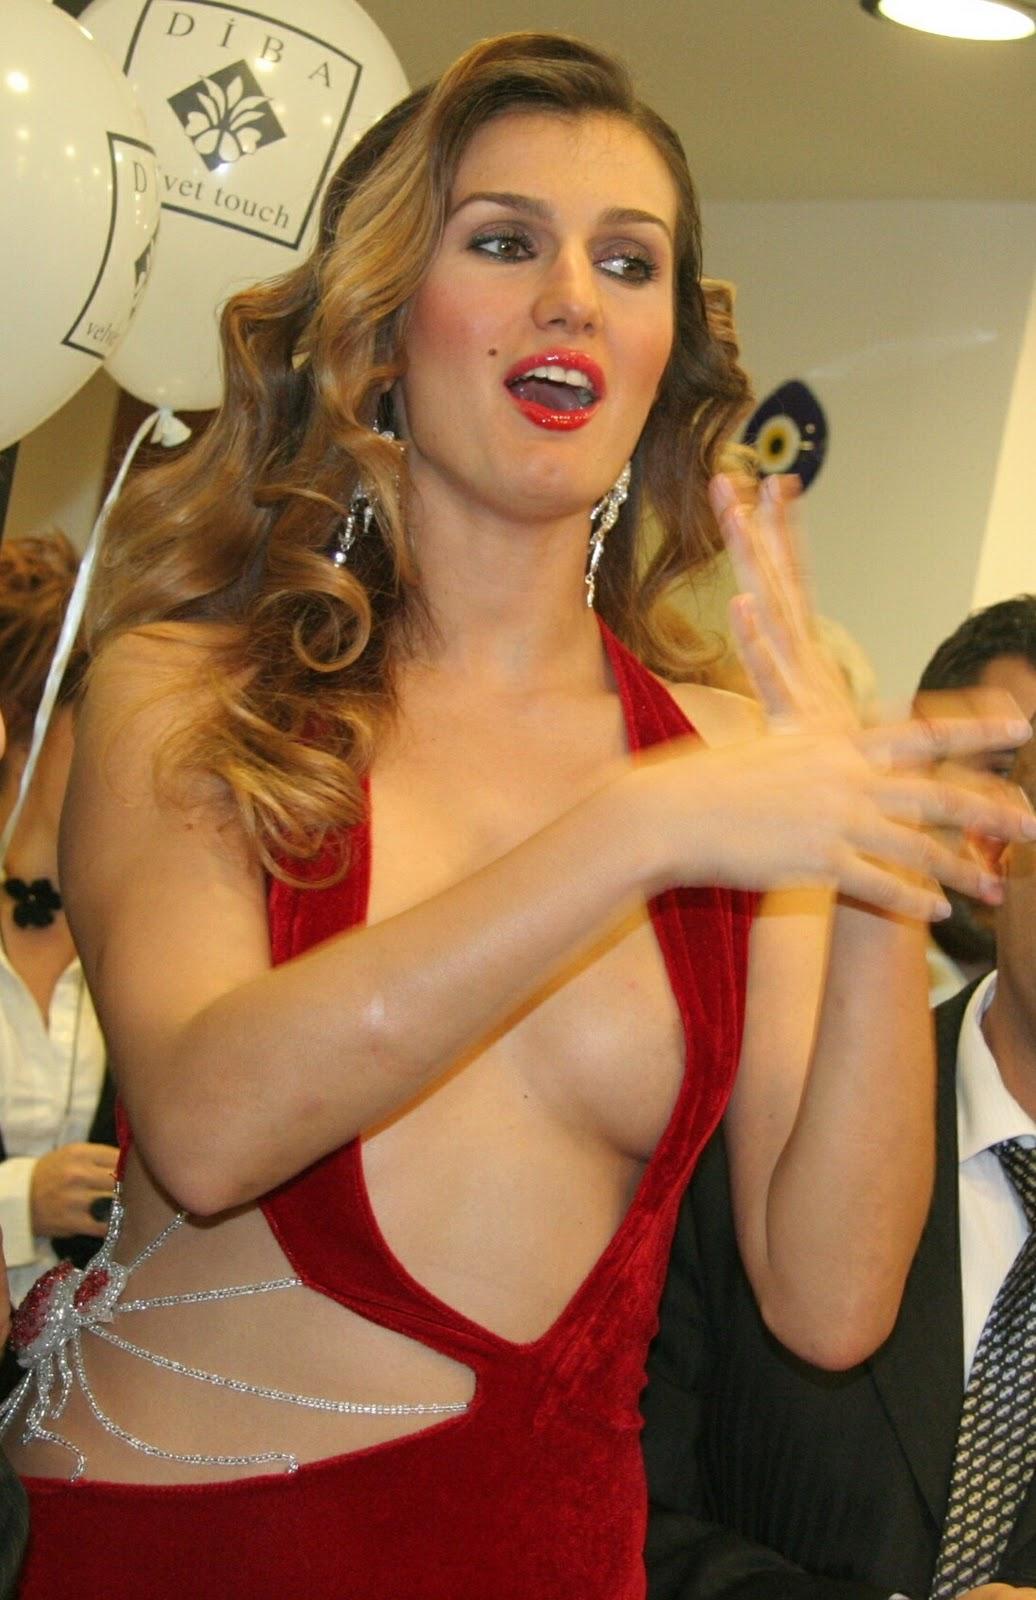 Amber sapphic erotica